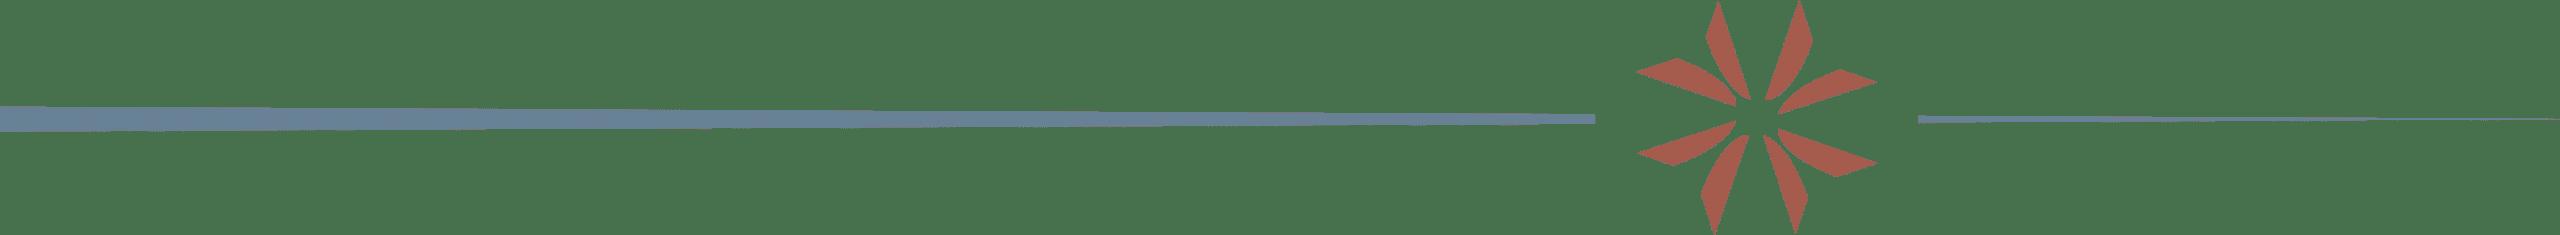 PofMT_LineGraphic